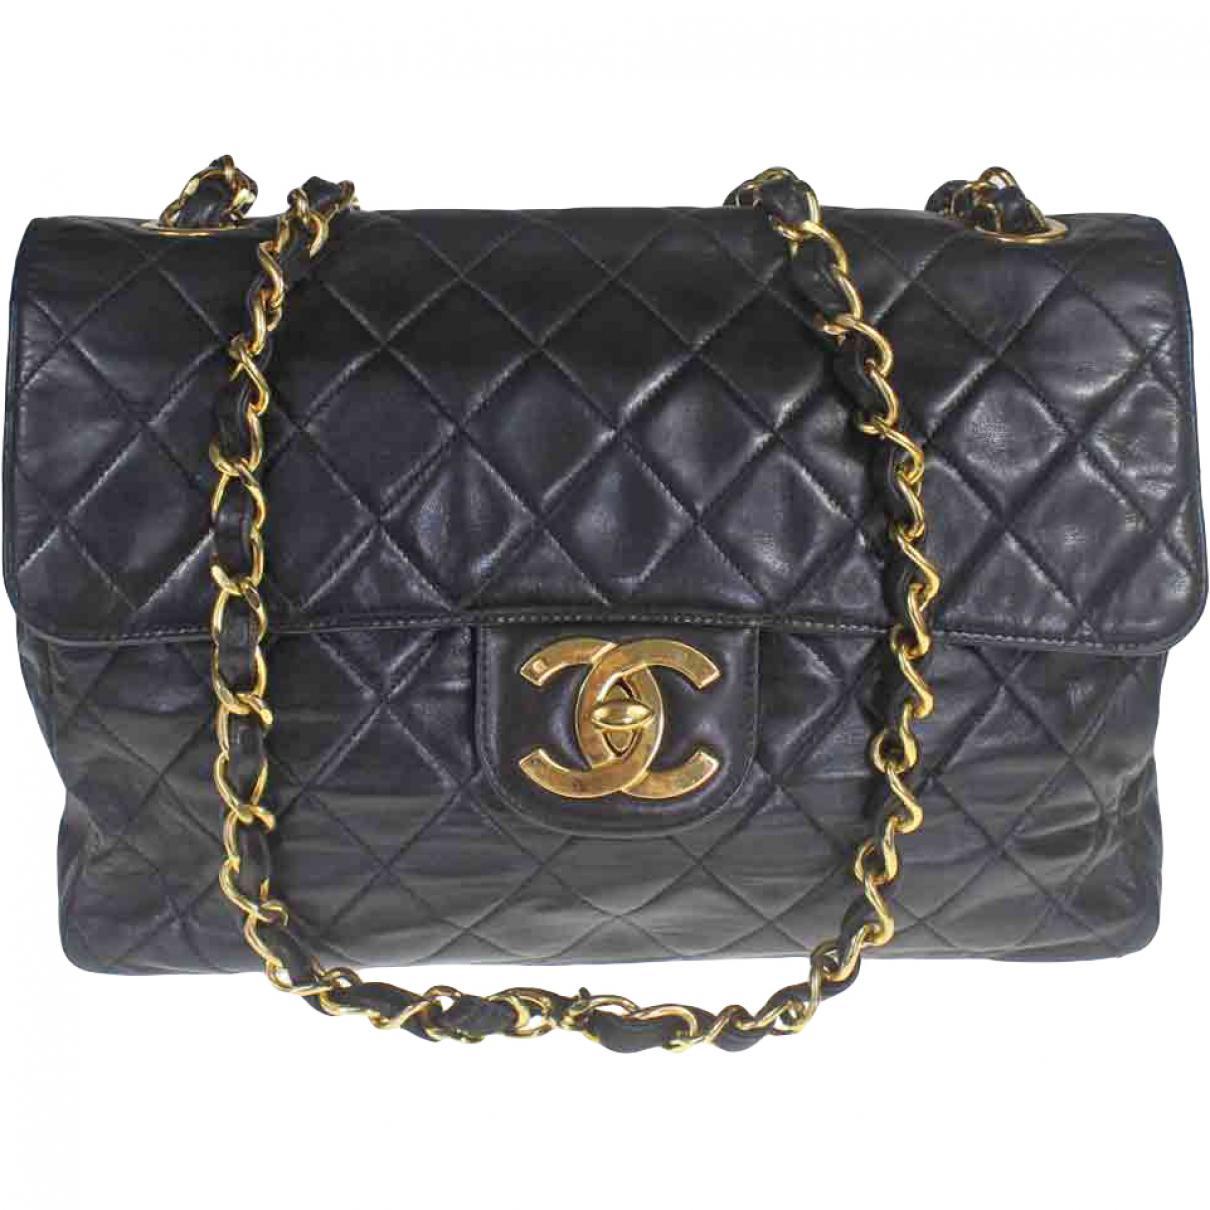 Chanel Women S Pre Owned Black Leather Handbag